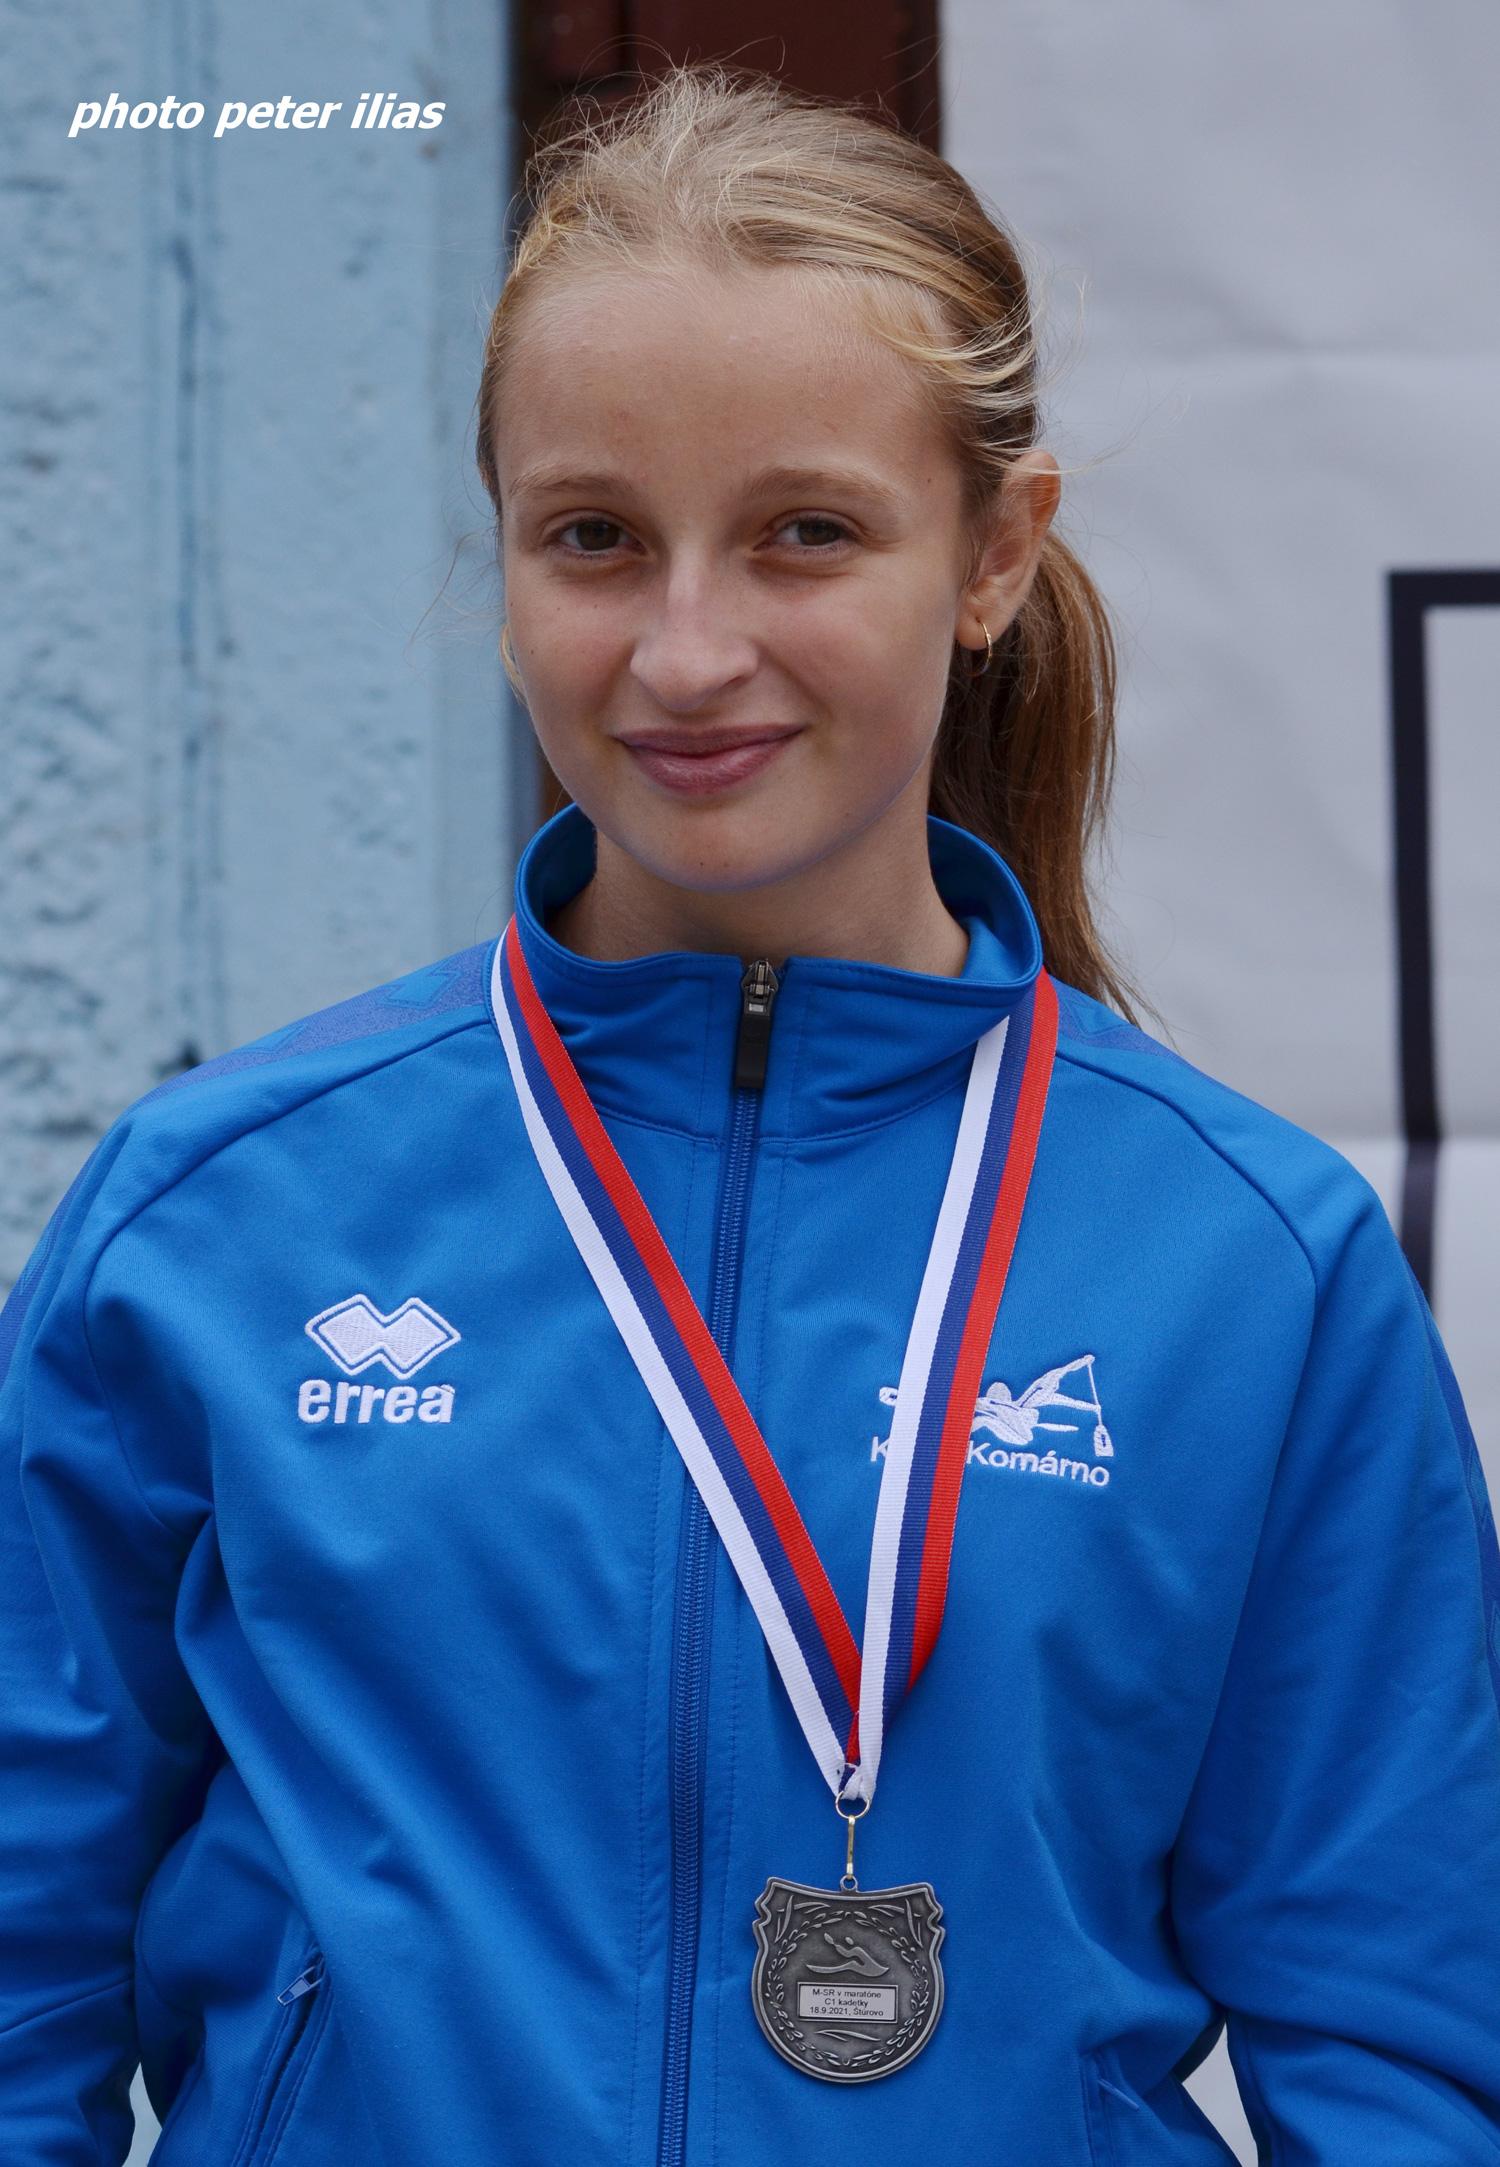 Majstrovstvá Slovenska - maratón - fotka